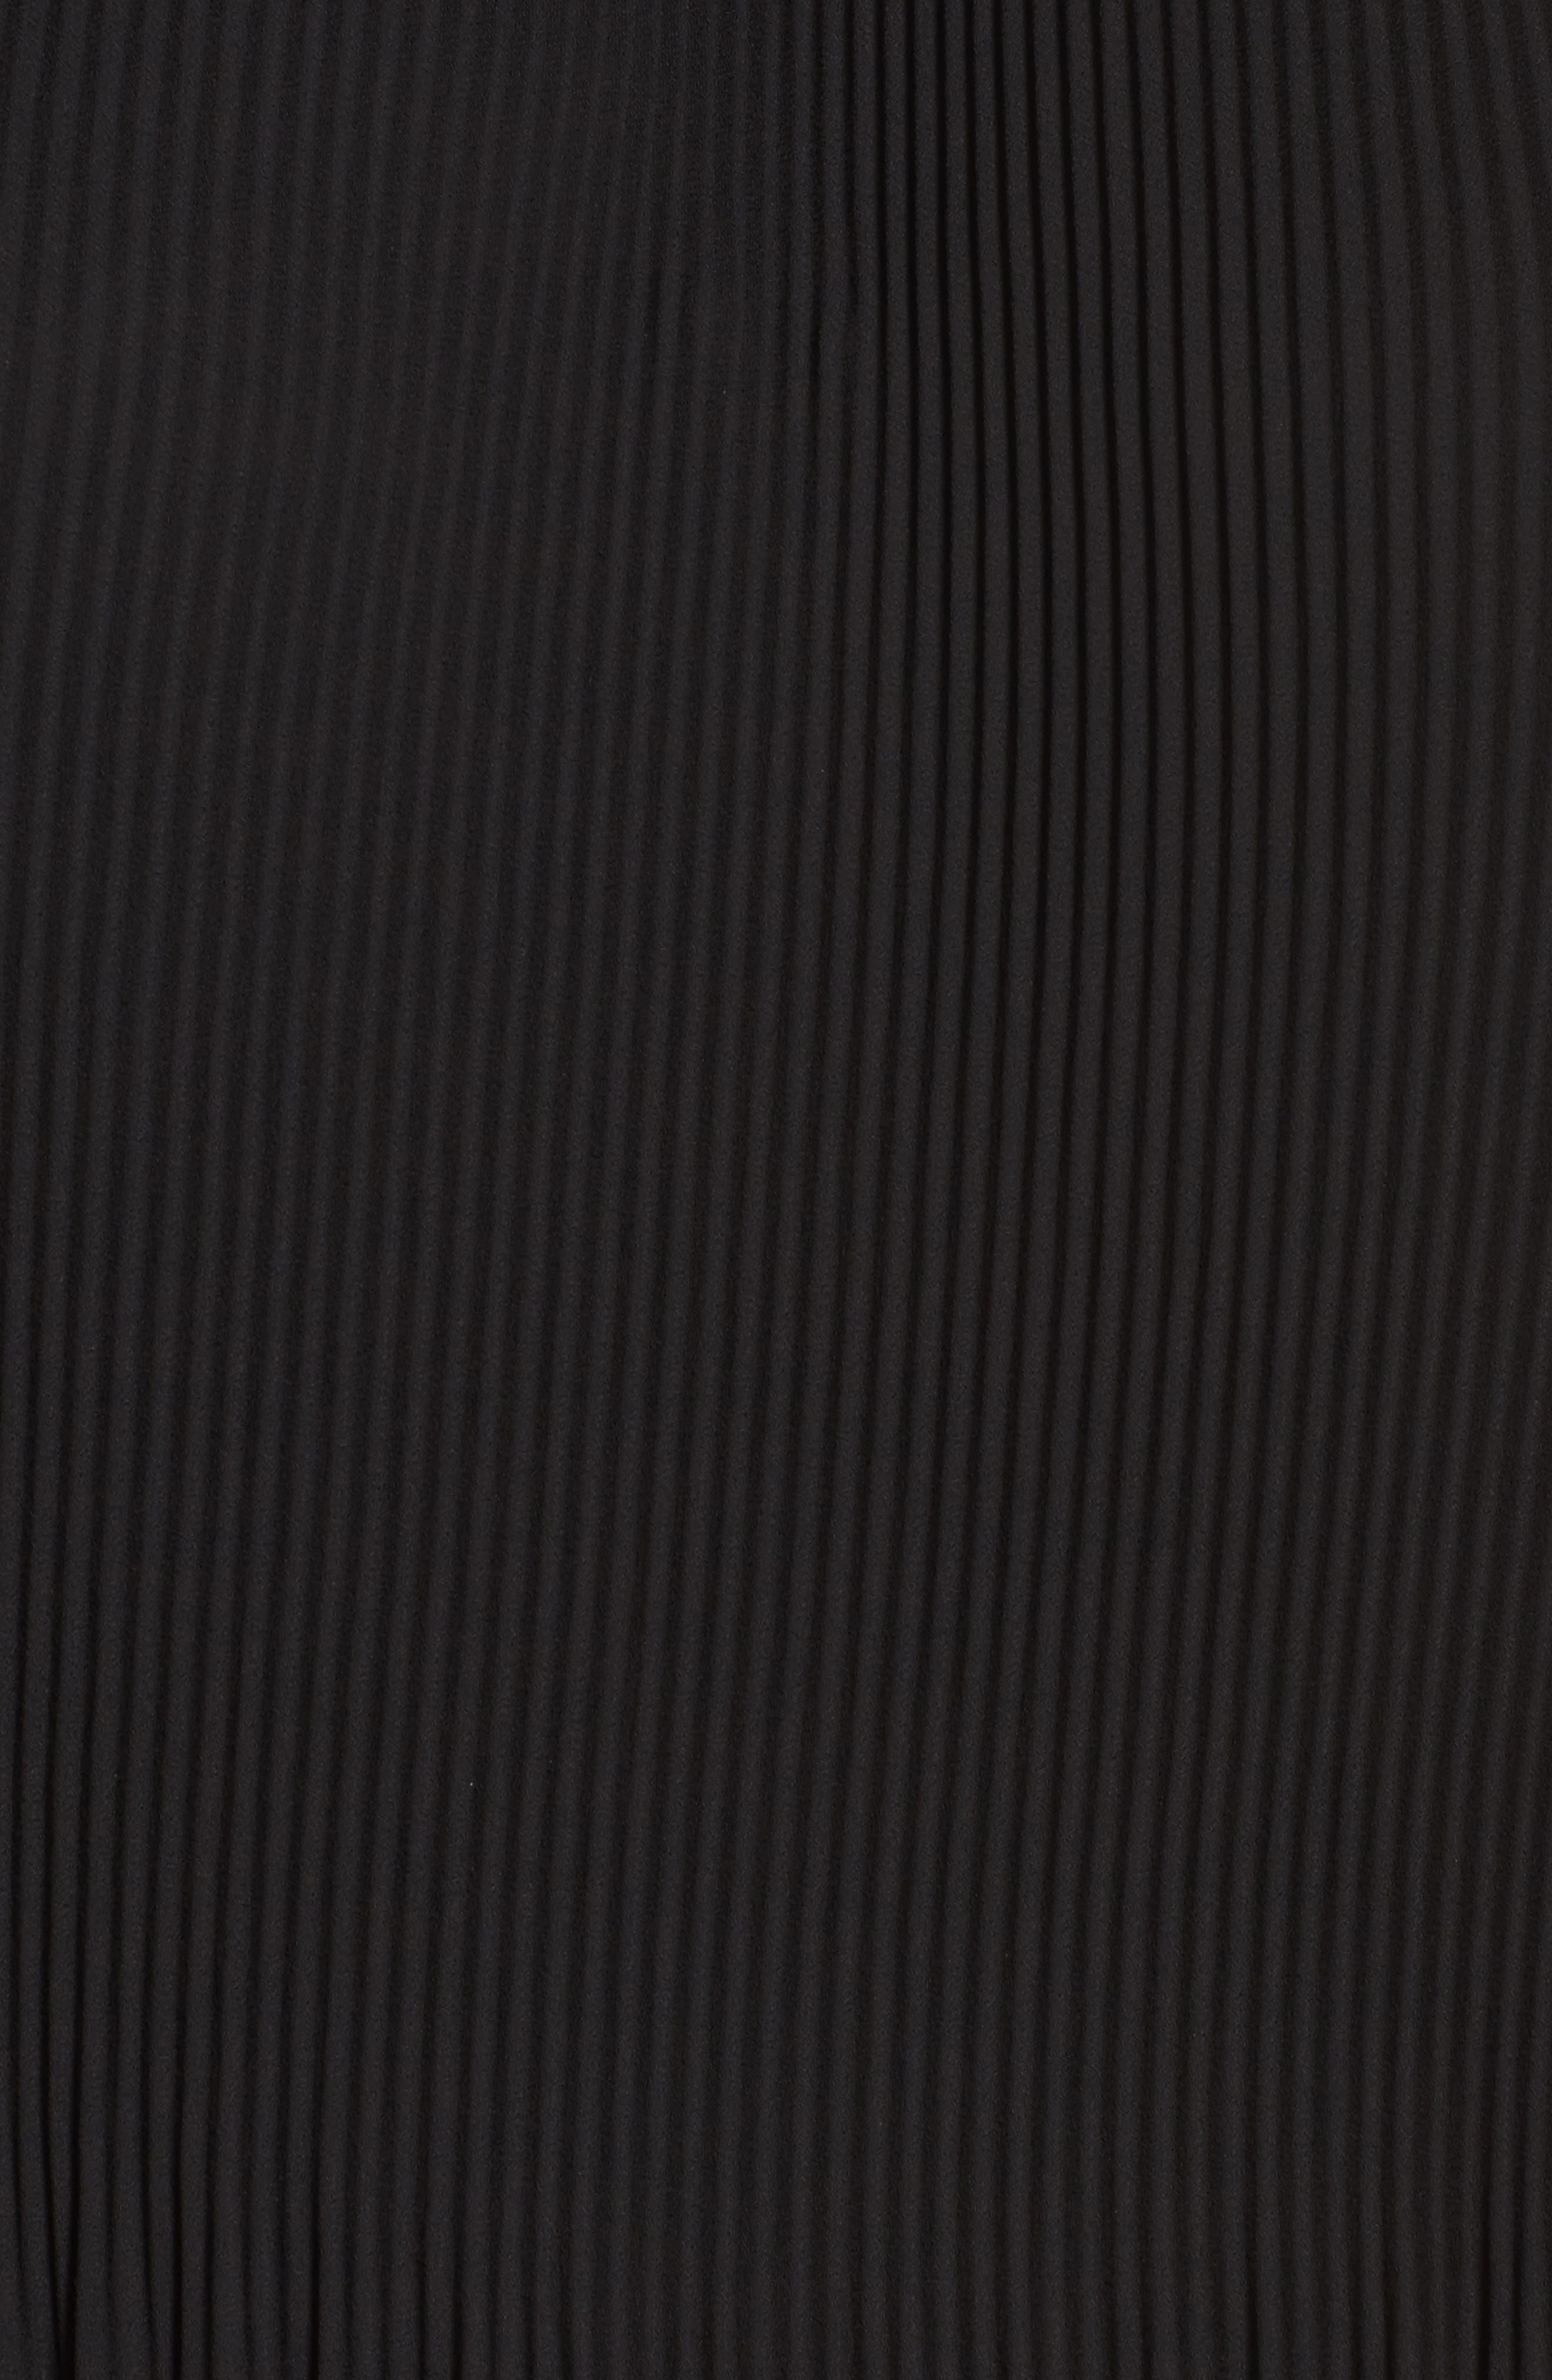 Pleat Shell,                             Alternate thumbnail 5, color,                             001